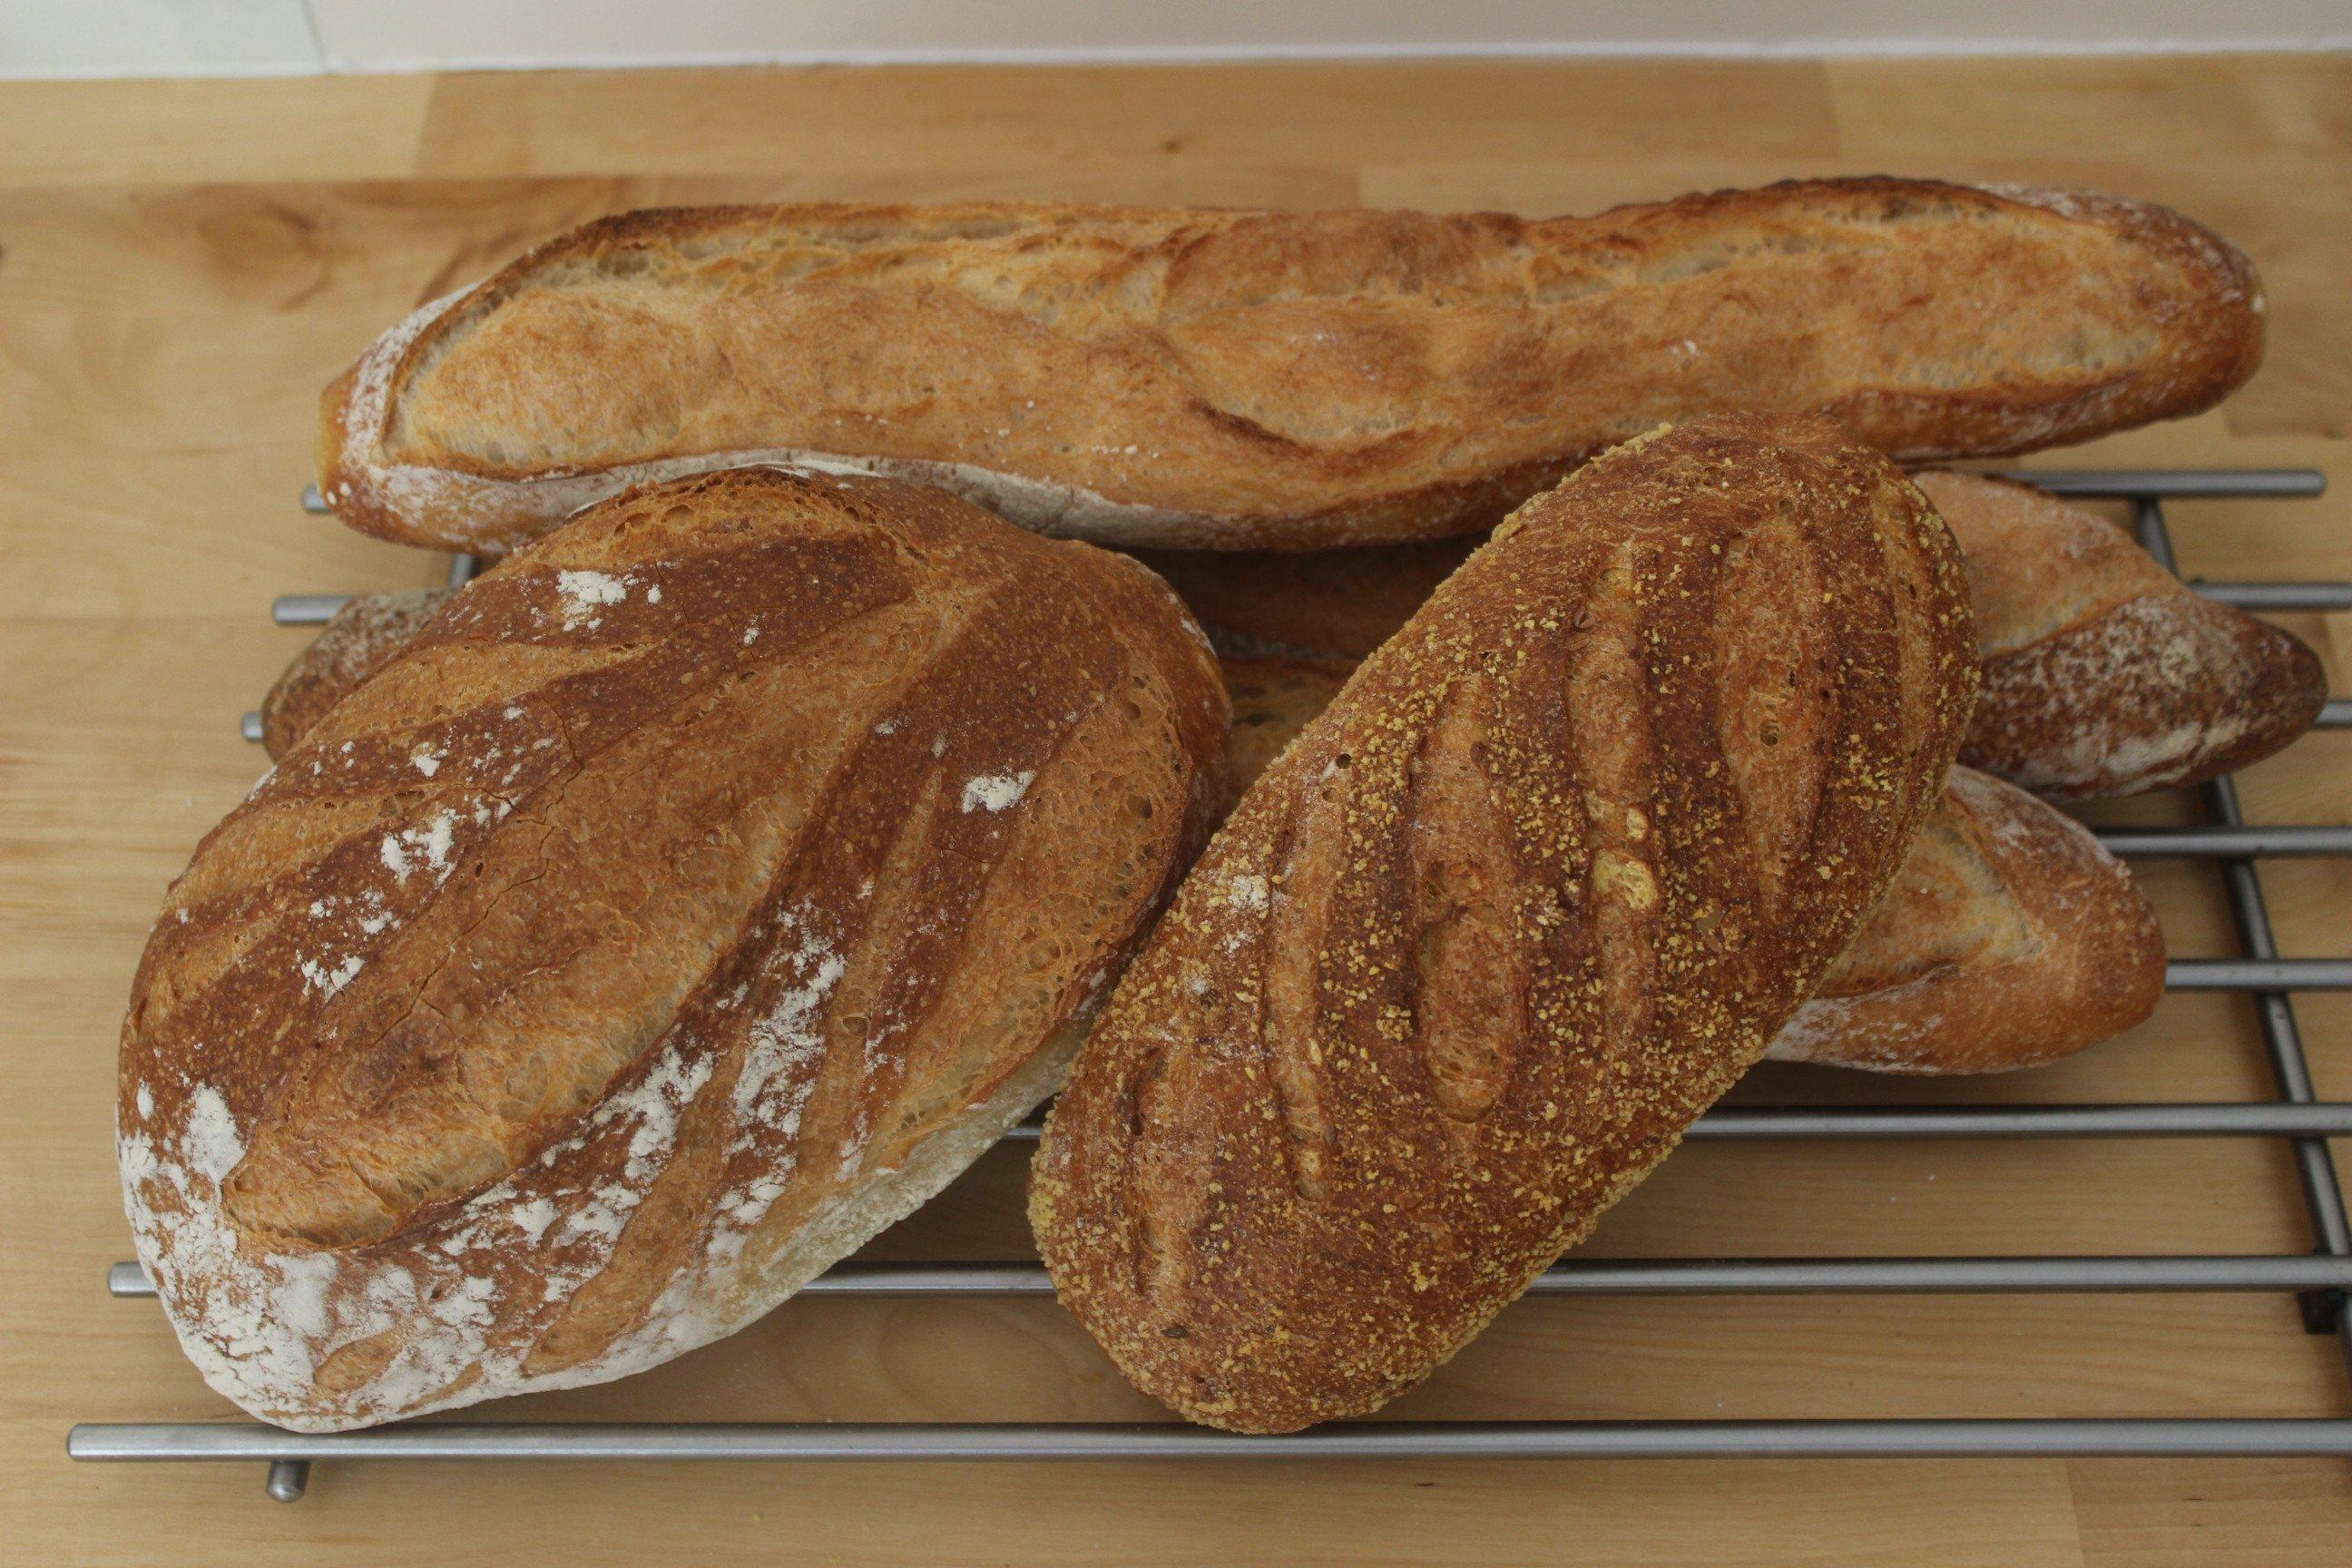 Gavray boulangeries